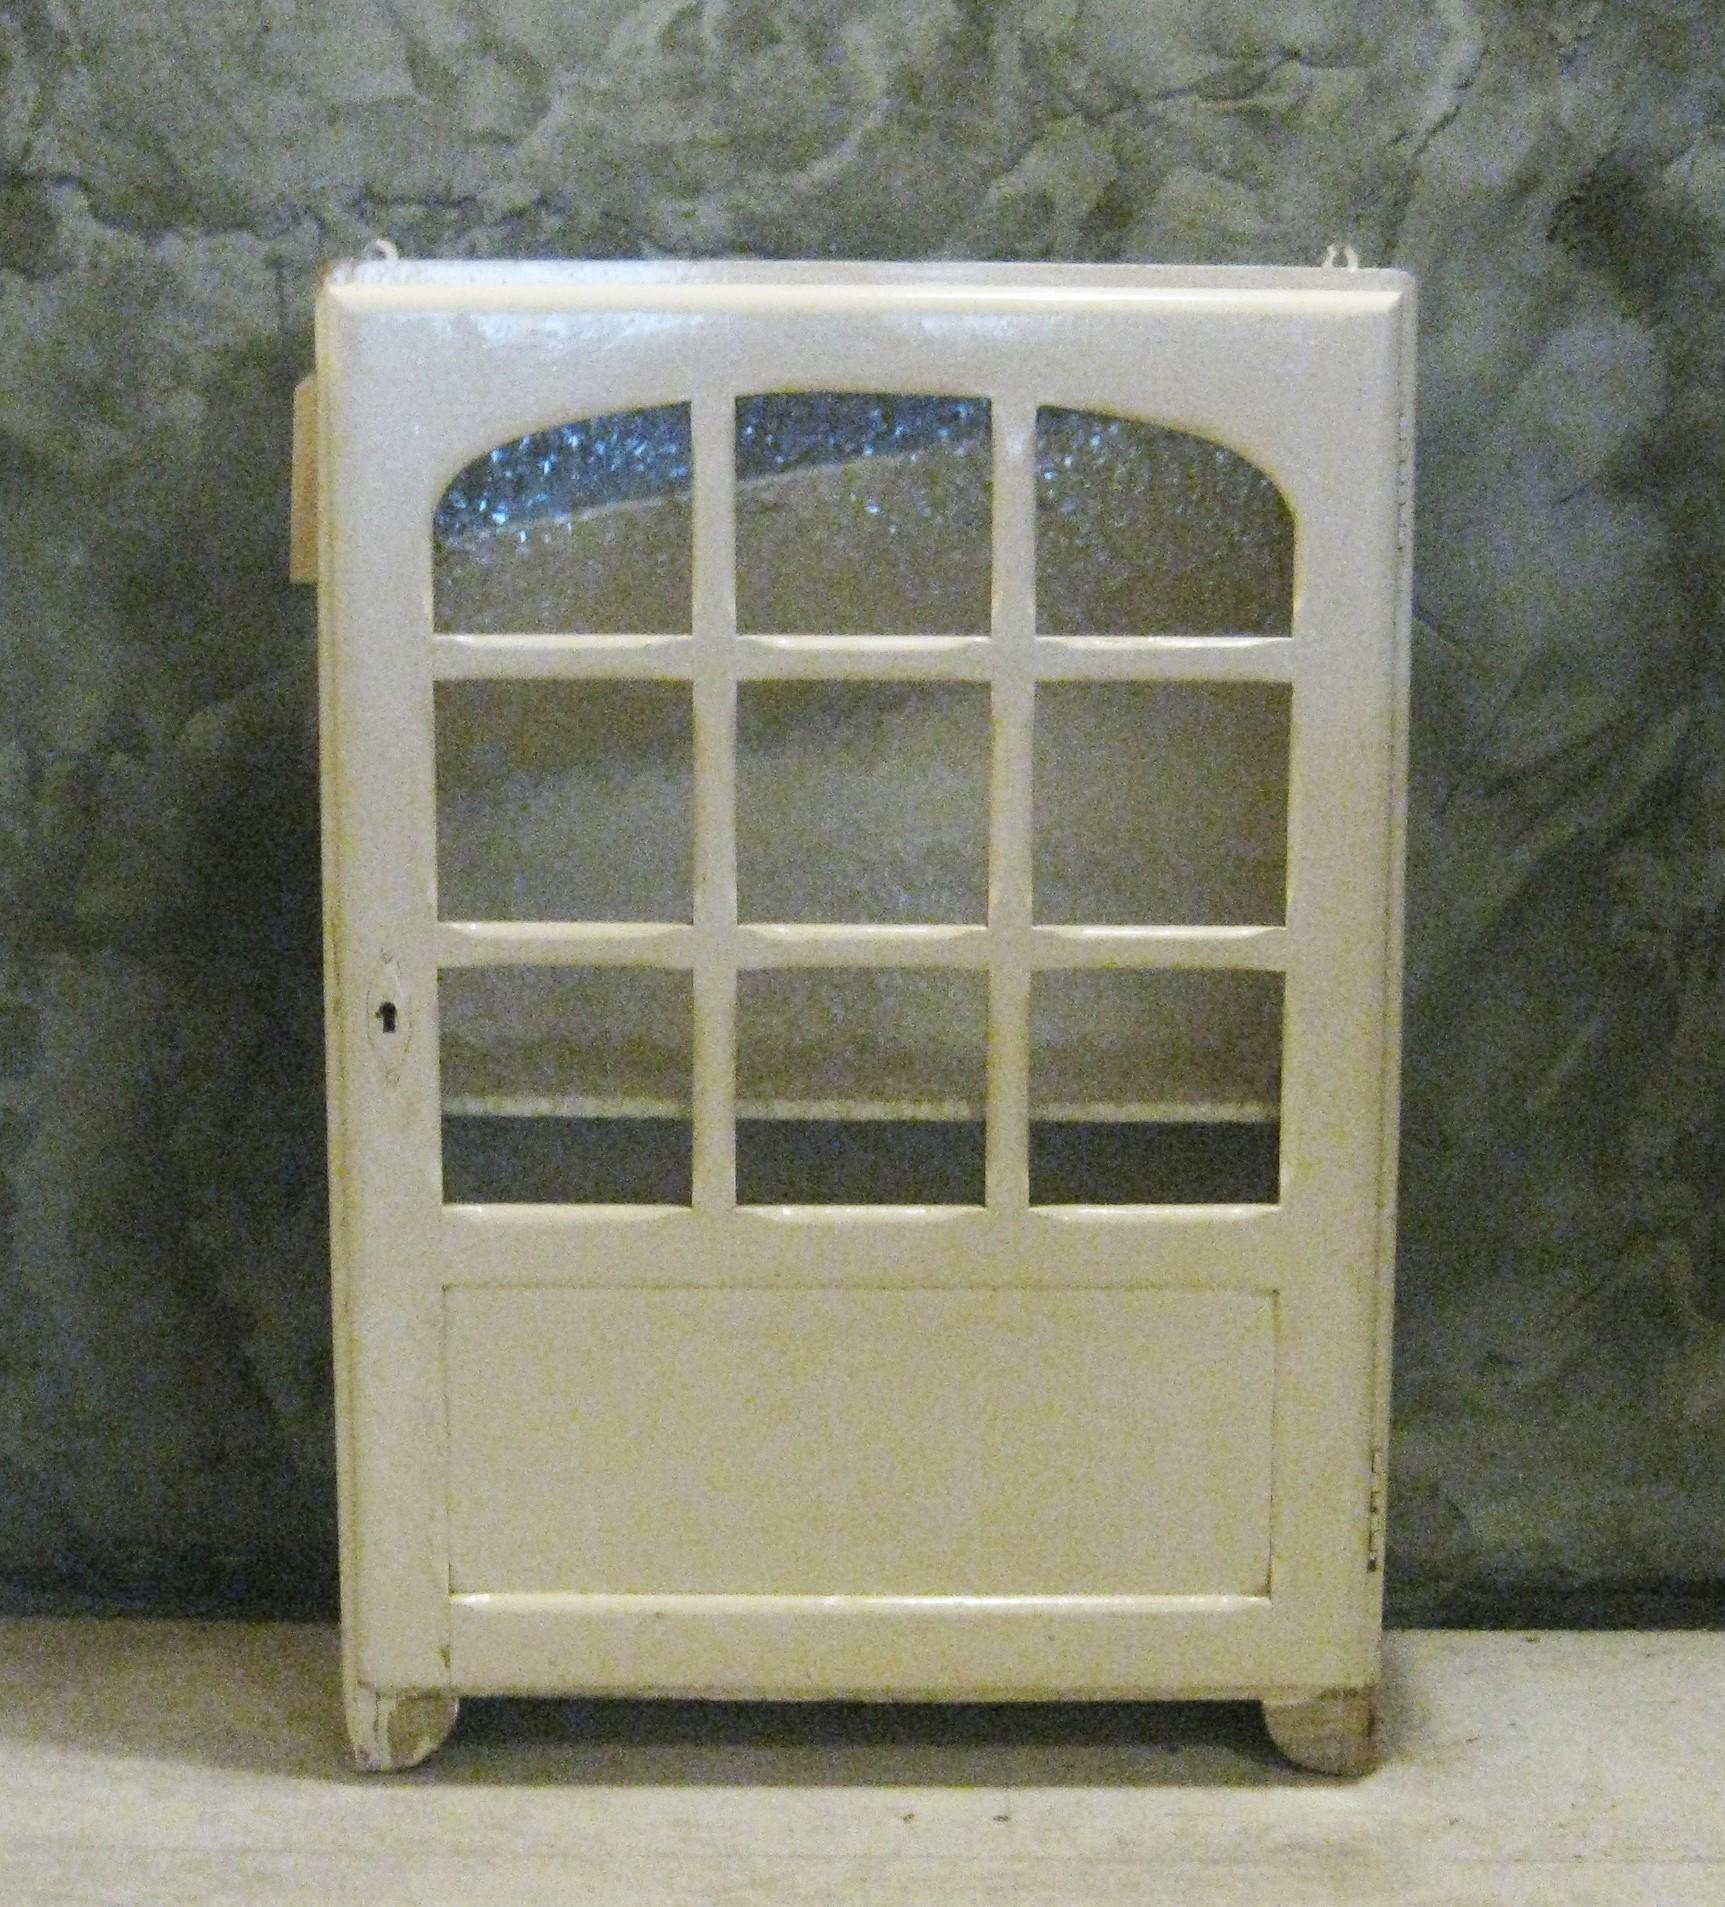 vintage art deco medicijnkastje wandkastje pakhuis frankrijk